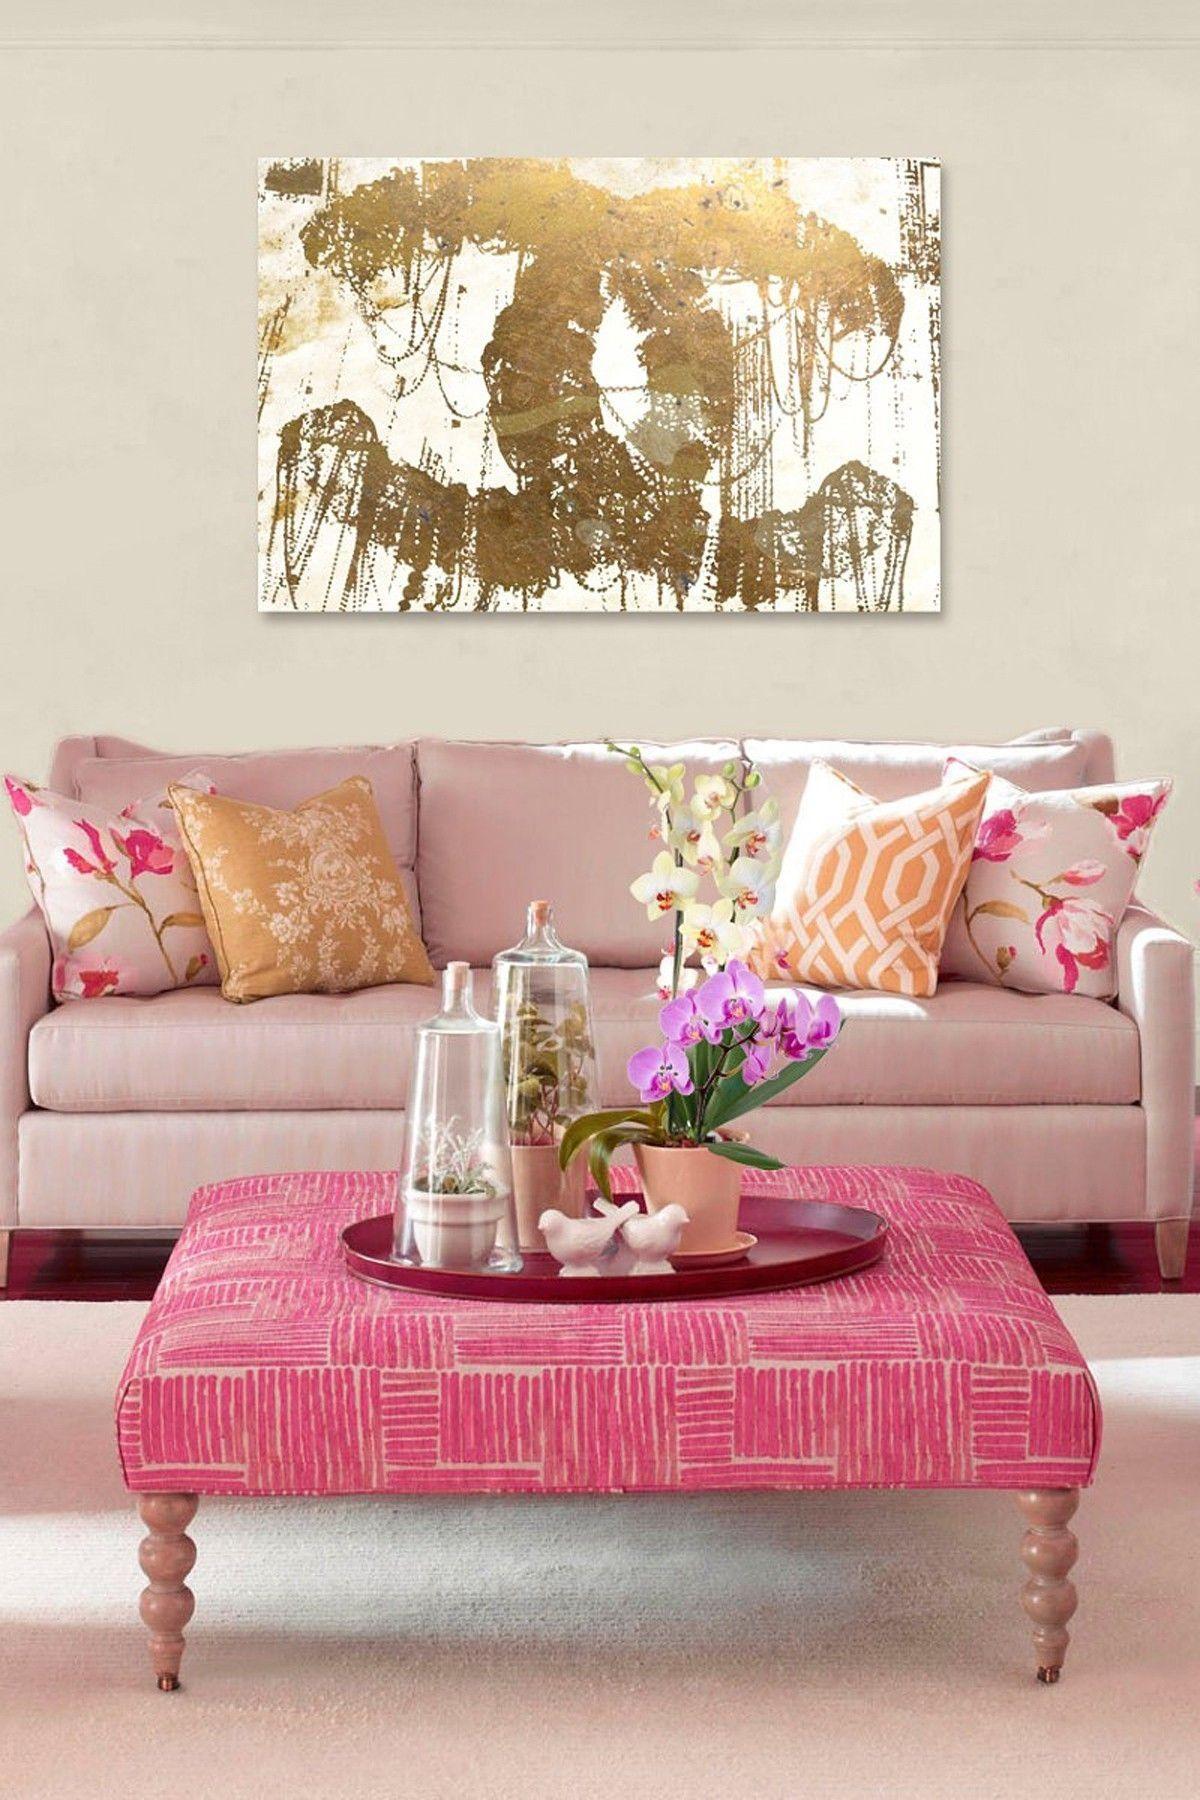 Living Room Setup, Artwork, Couch, Ottoman | Home | Pinterest ...